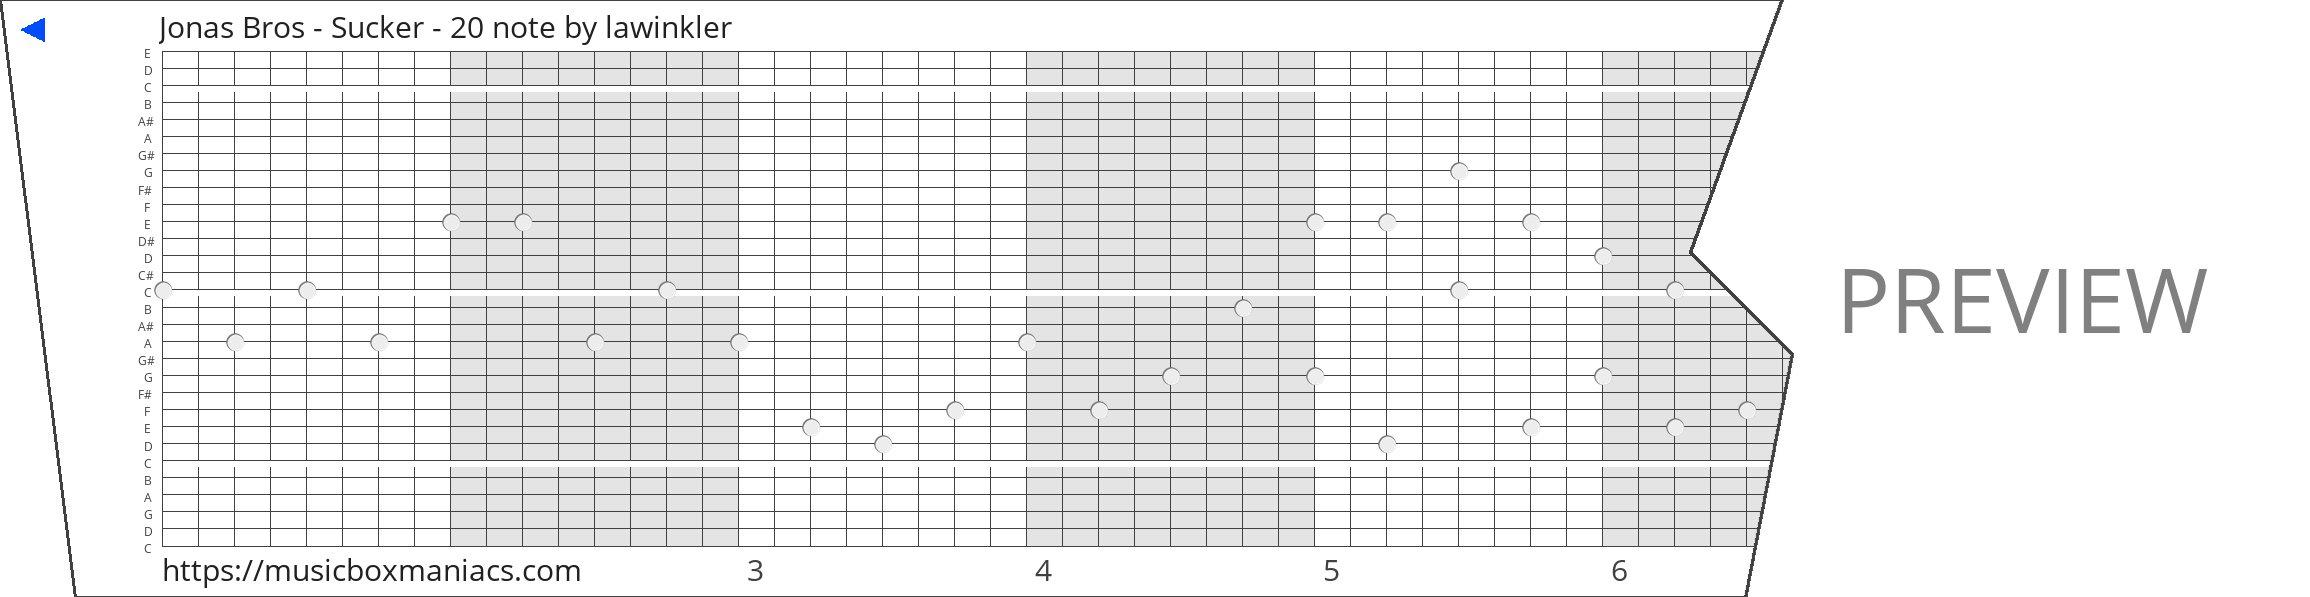 Jonas Bros - Sucker - 20 note 30 note music box paper strip